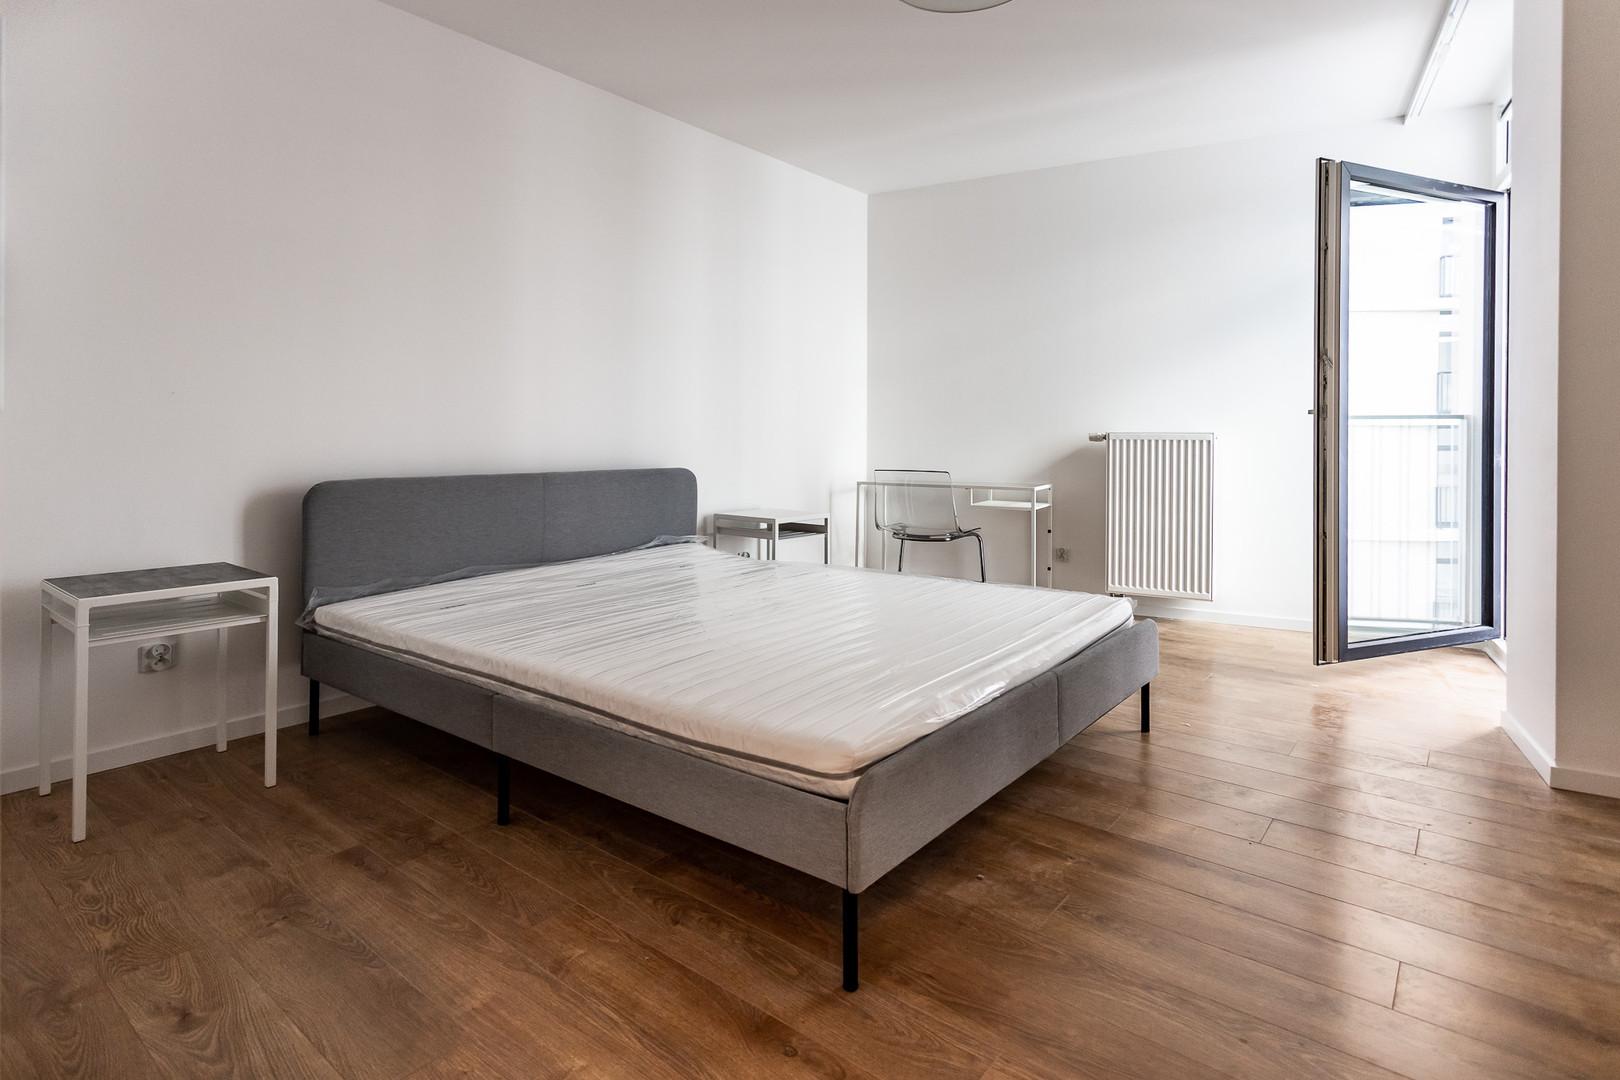 Property for rent Warasaw Grzybowska4.jp